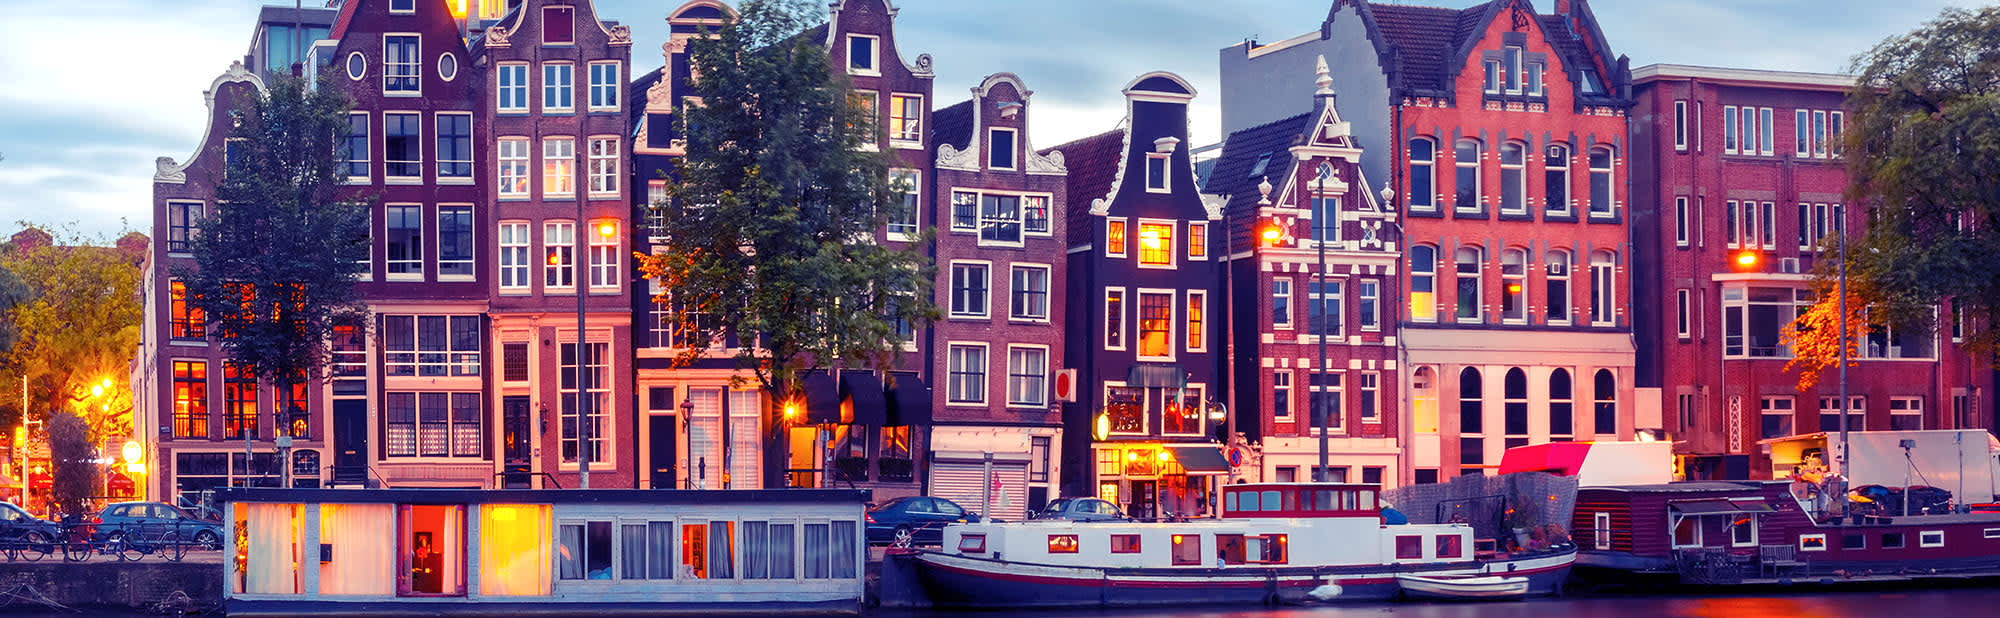 Despre Amsterdam (Olanda), cand sa mergi, perioade bune si atractii turistice